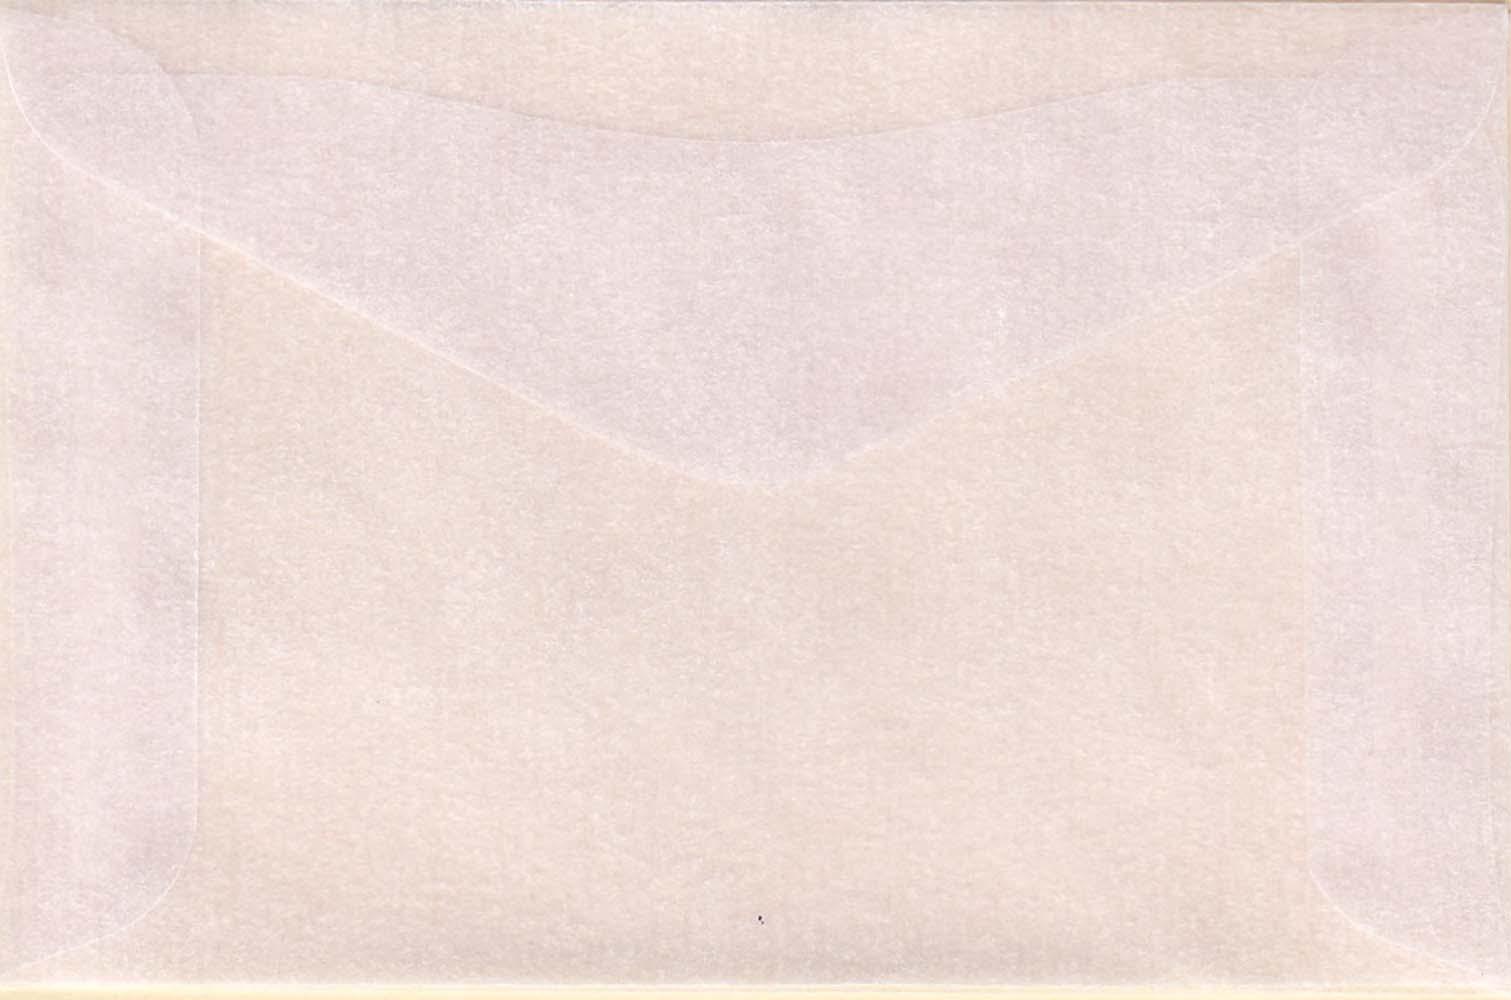 100 #2 Glassine Envelopes measuring 2 5//16 x 3 5//8